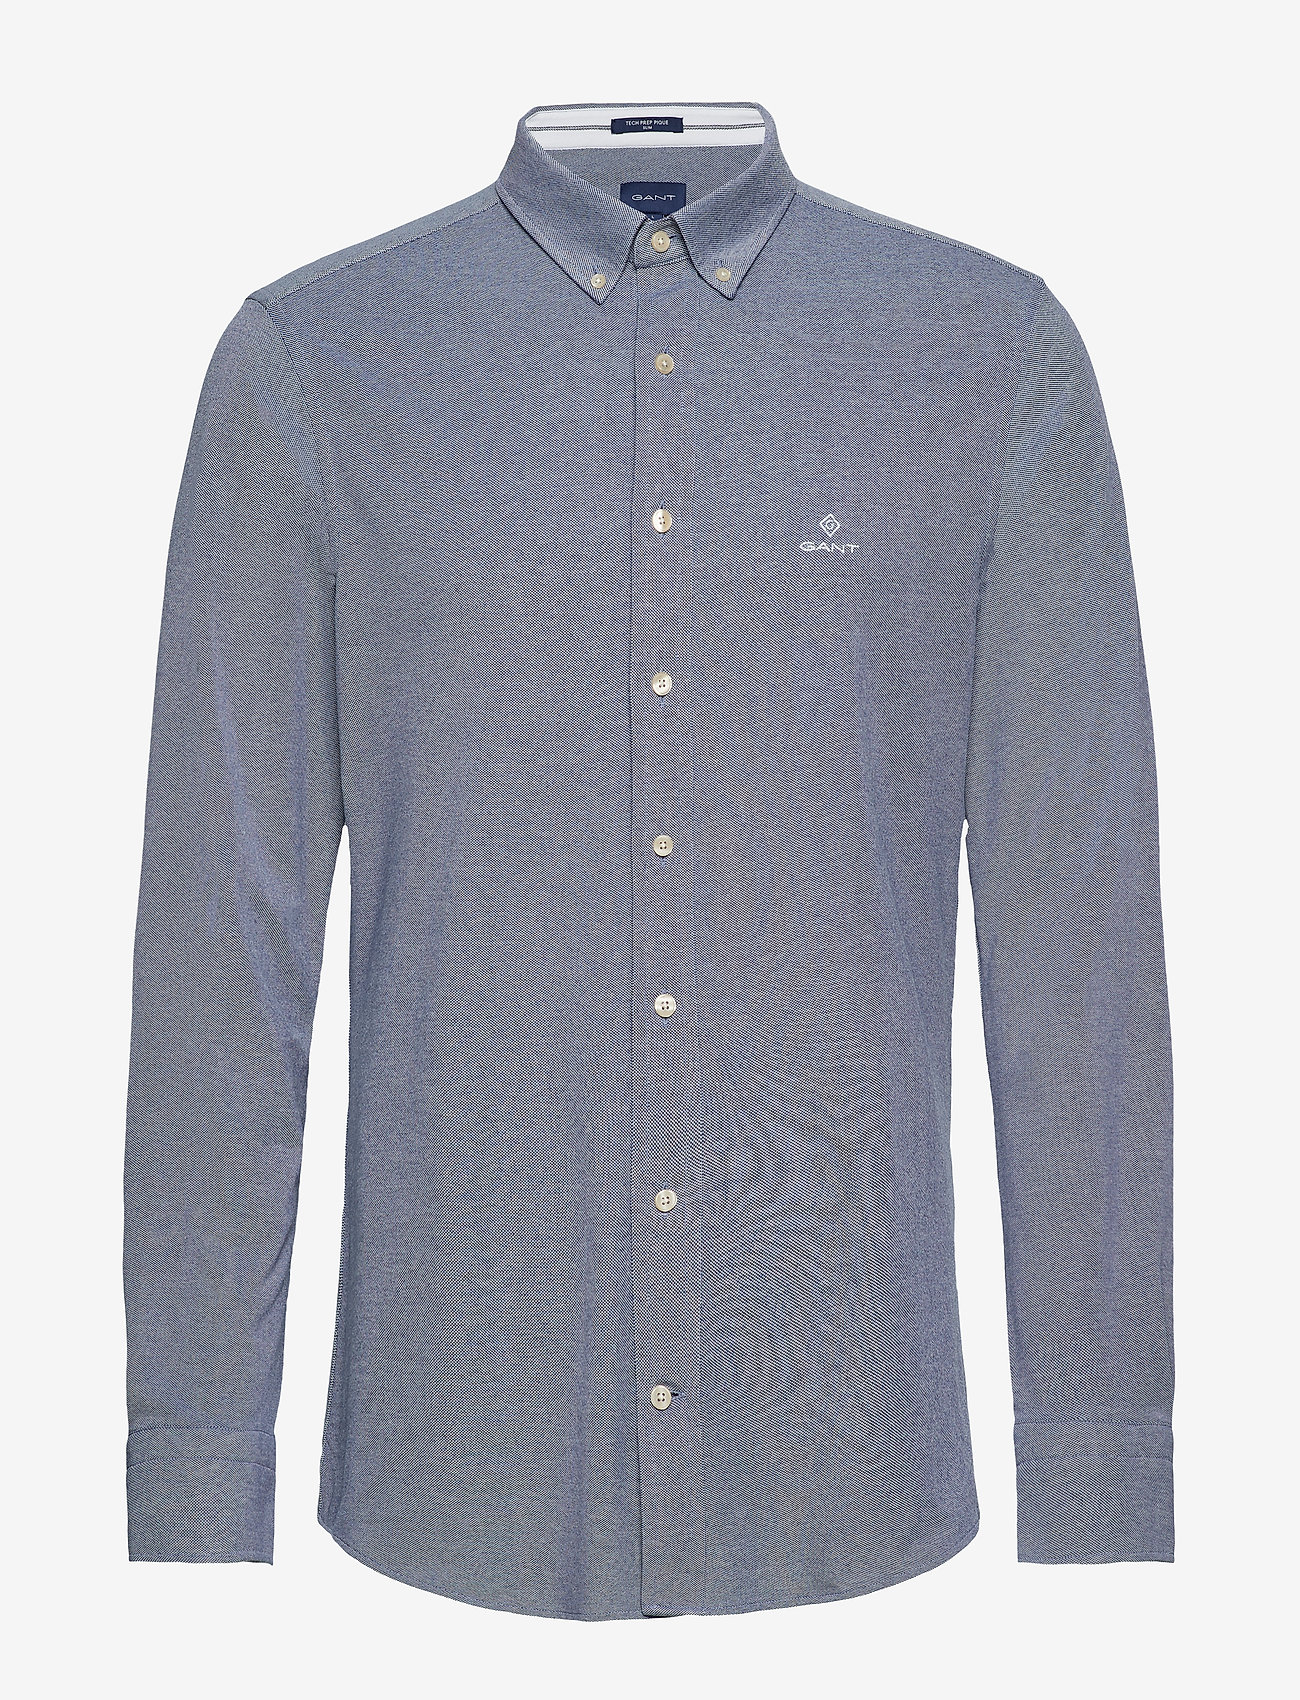 GANT - TP SLIM PIQUE BD - basic shirts - persian blue - 0